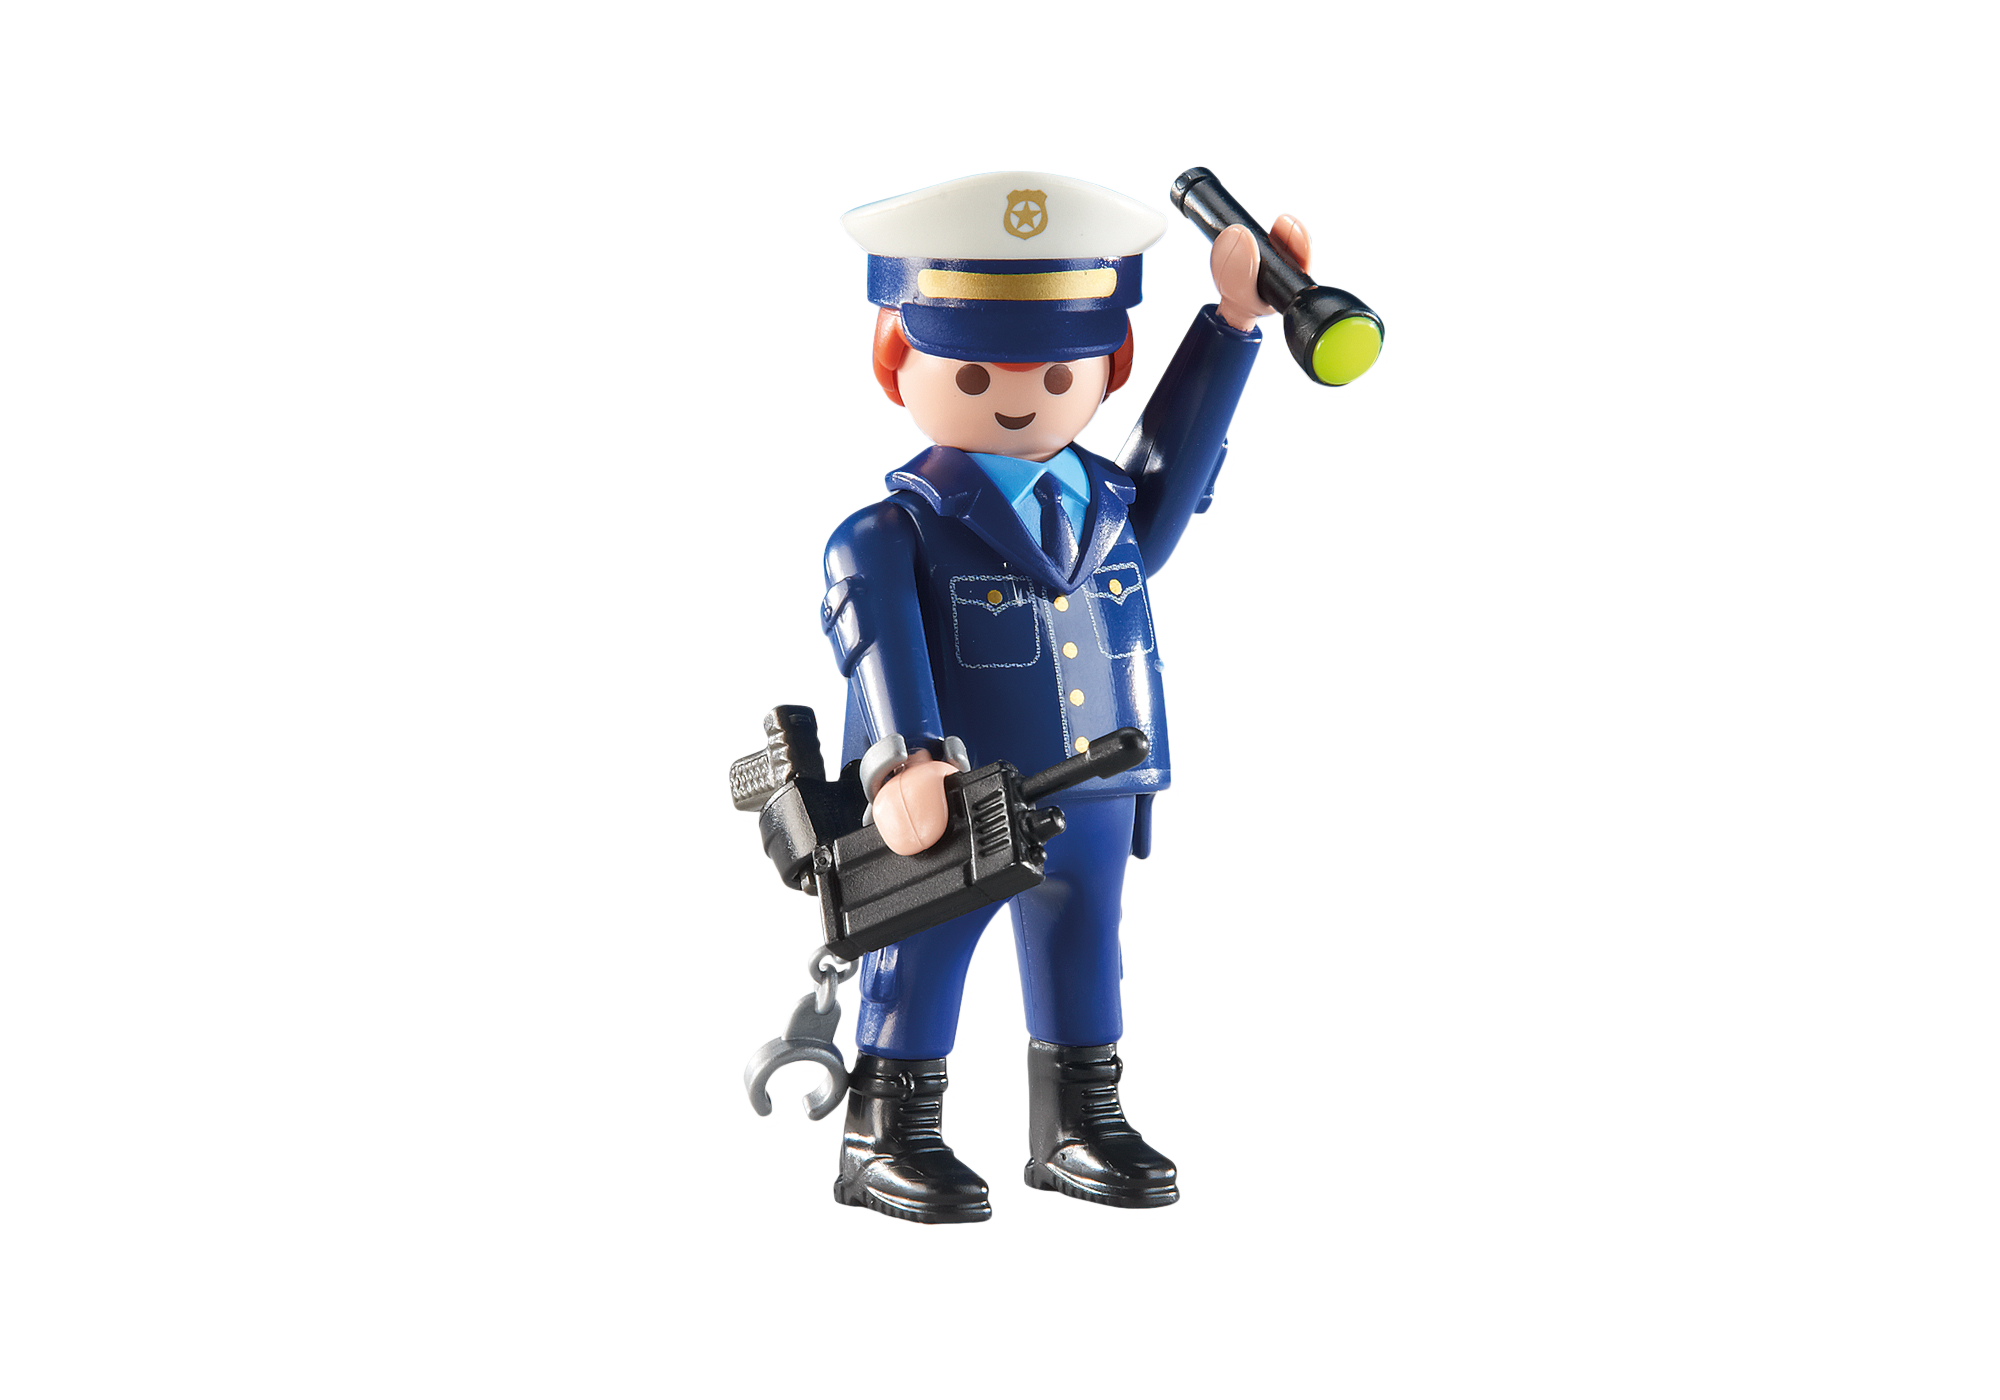 http://media.playmobil.com/i/playmobil/6502_product_detail/Chef des policiers